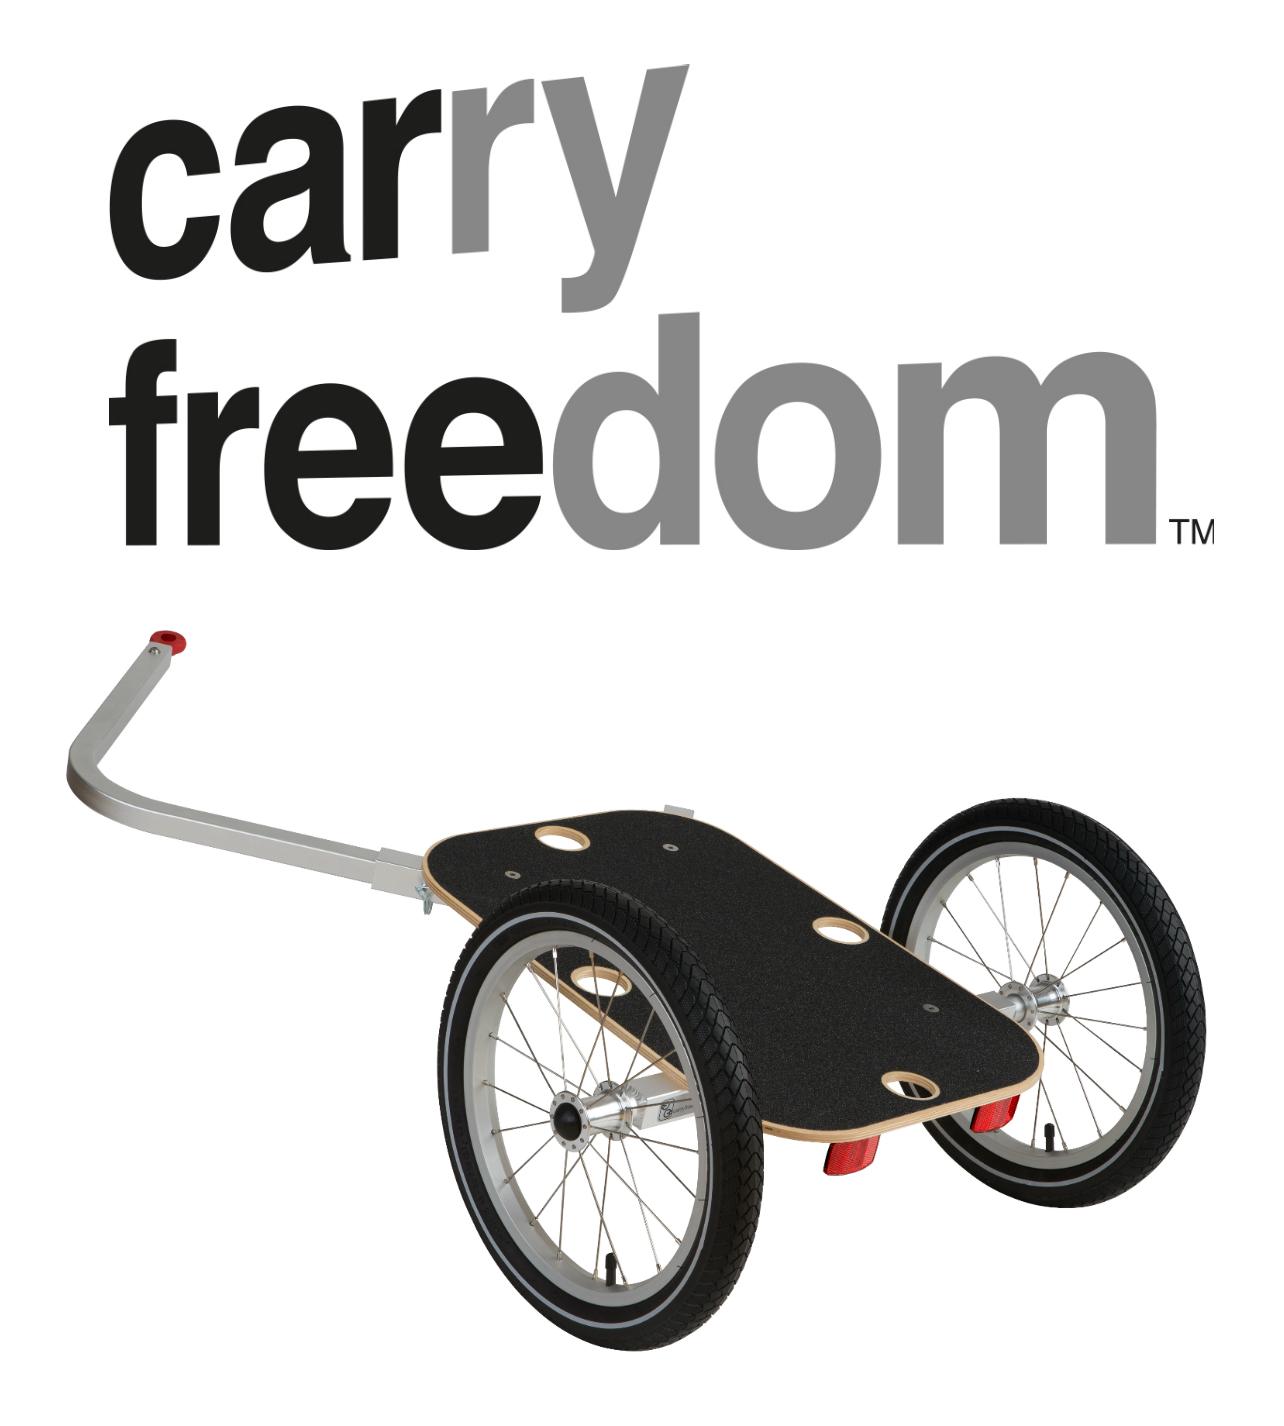 Carry freedom neu